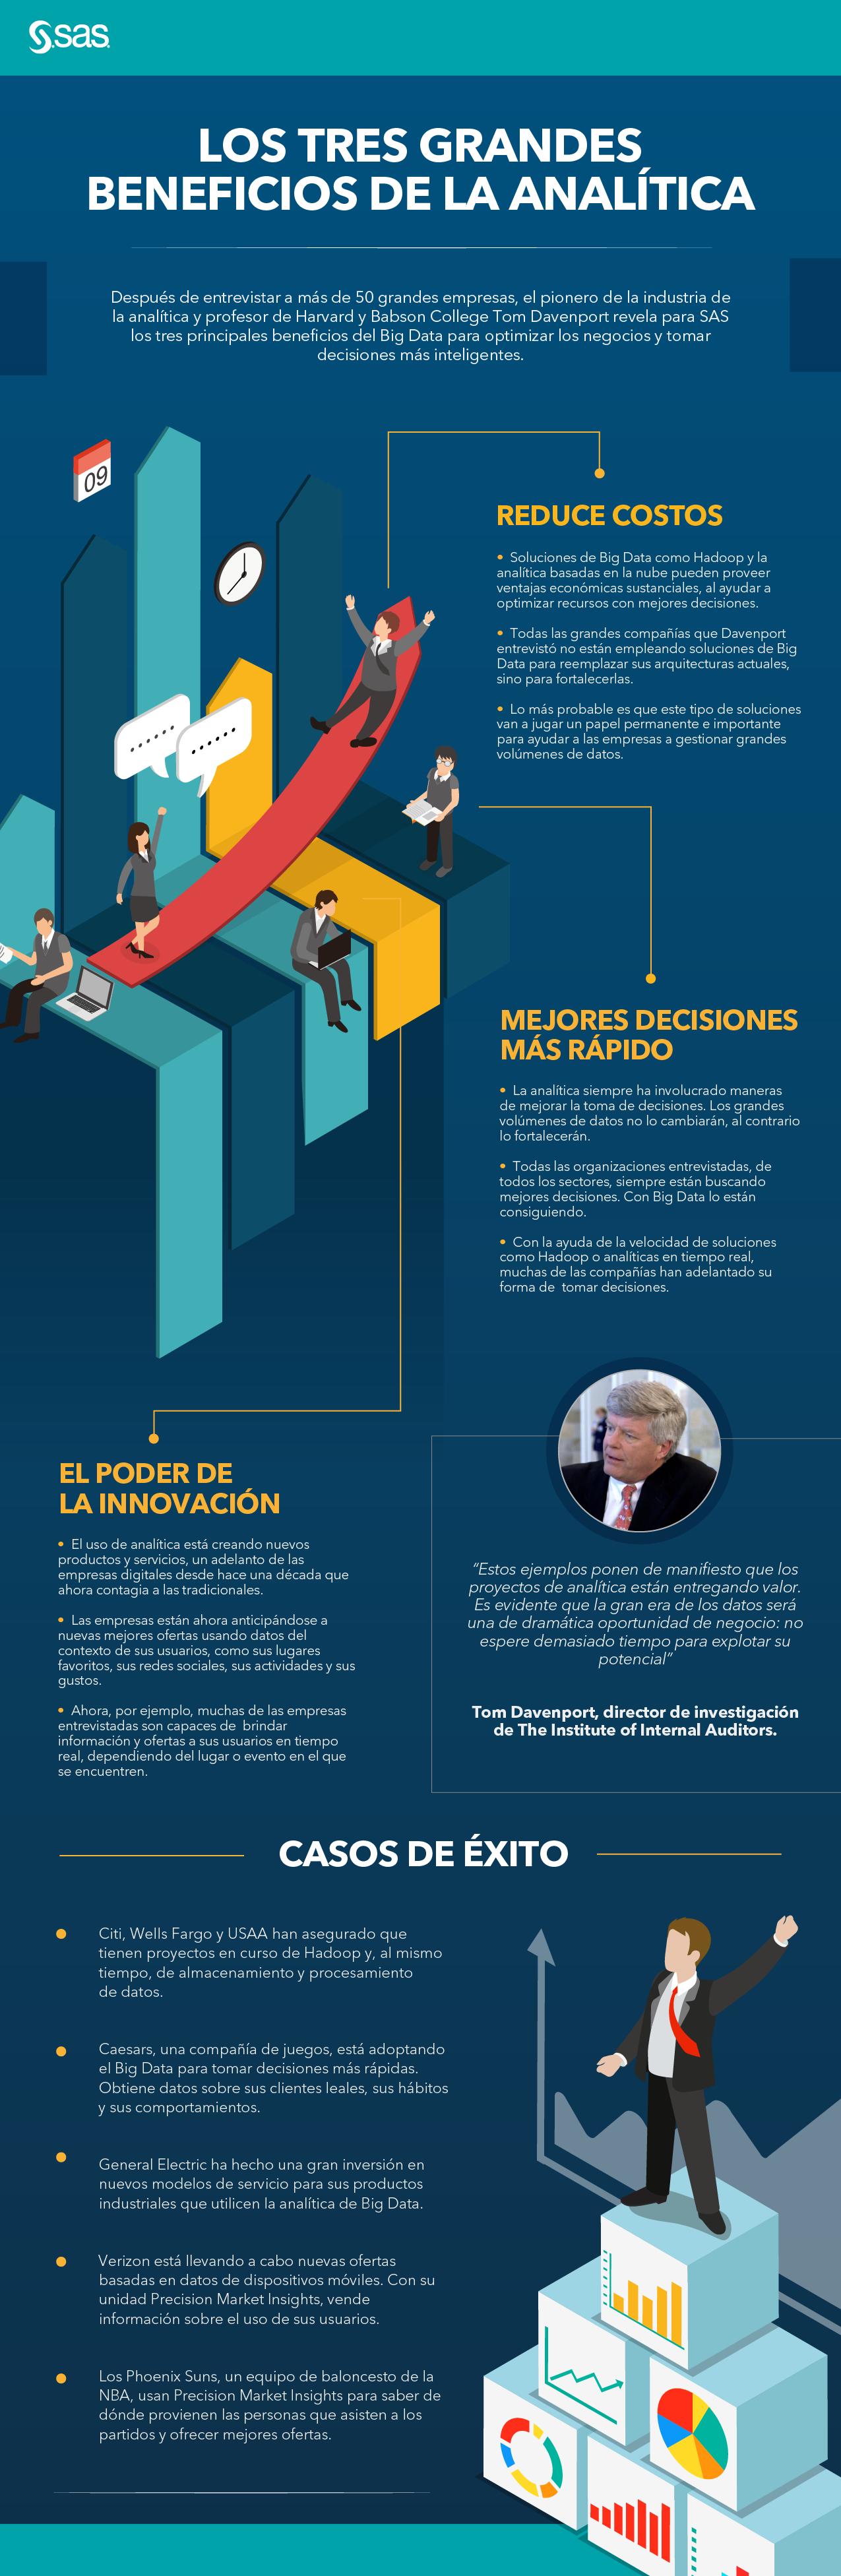 Infografia Sas 3 Beneficios